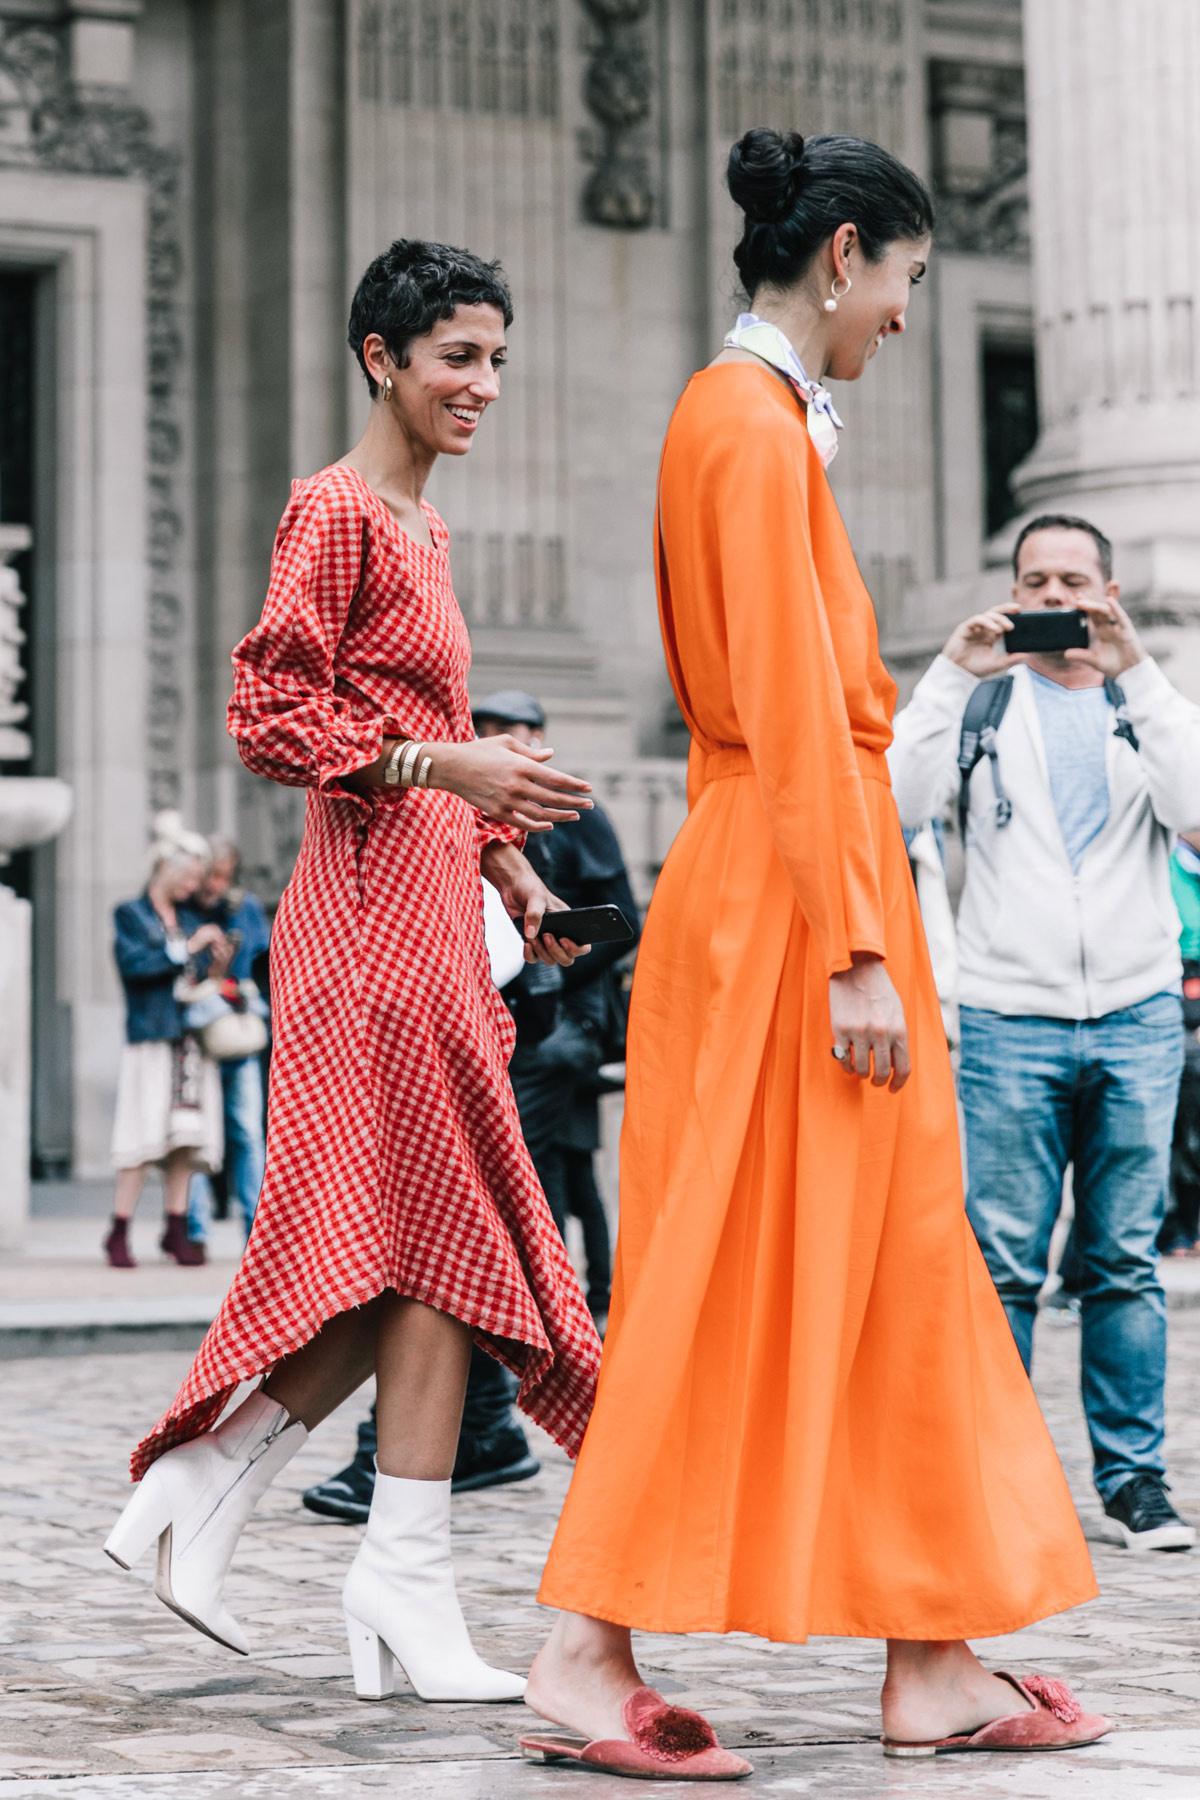 street_style_paris_fashion_week_dia3_balmain_chloe_isabel_maran_203613656_1200x1800